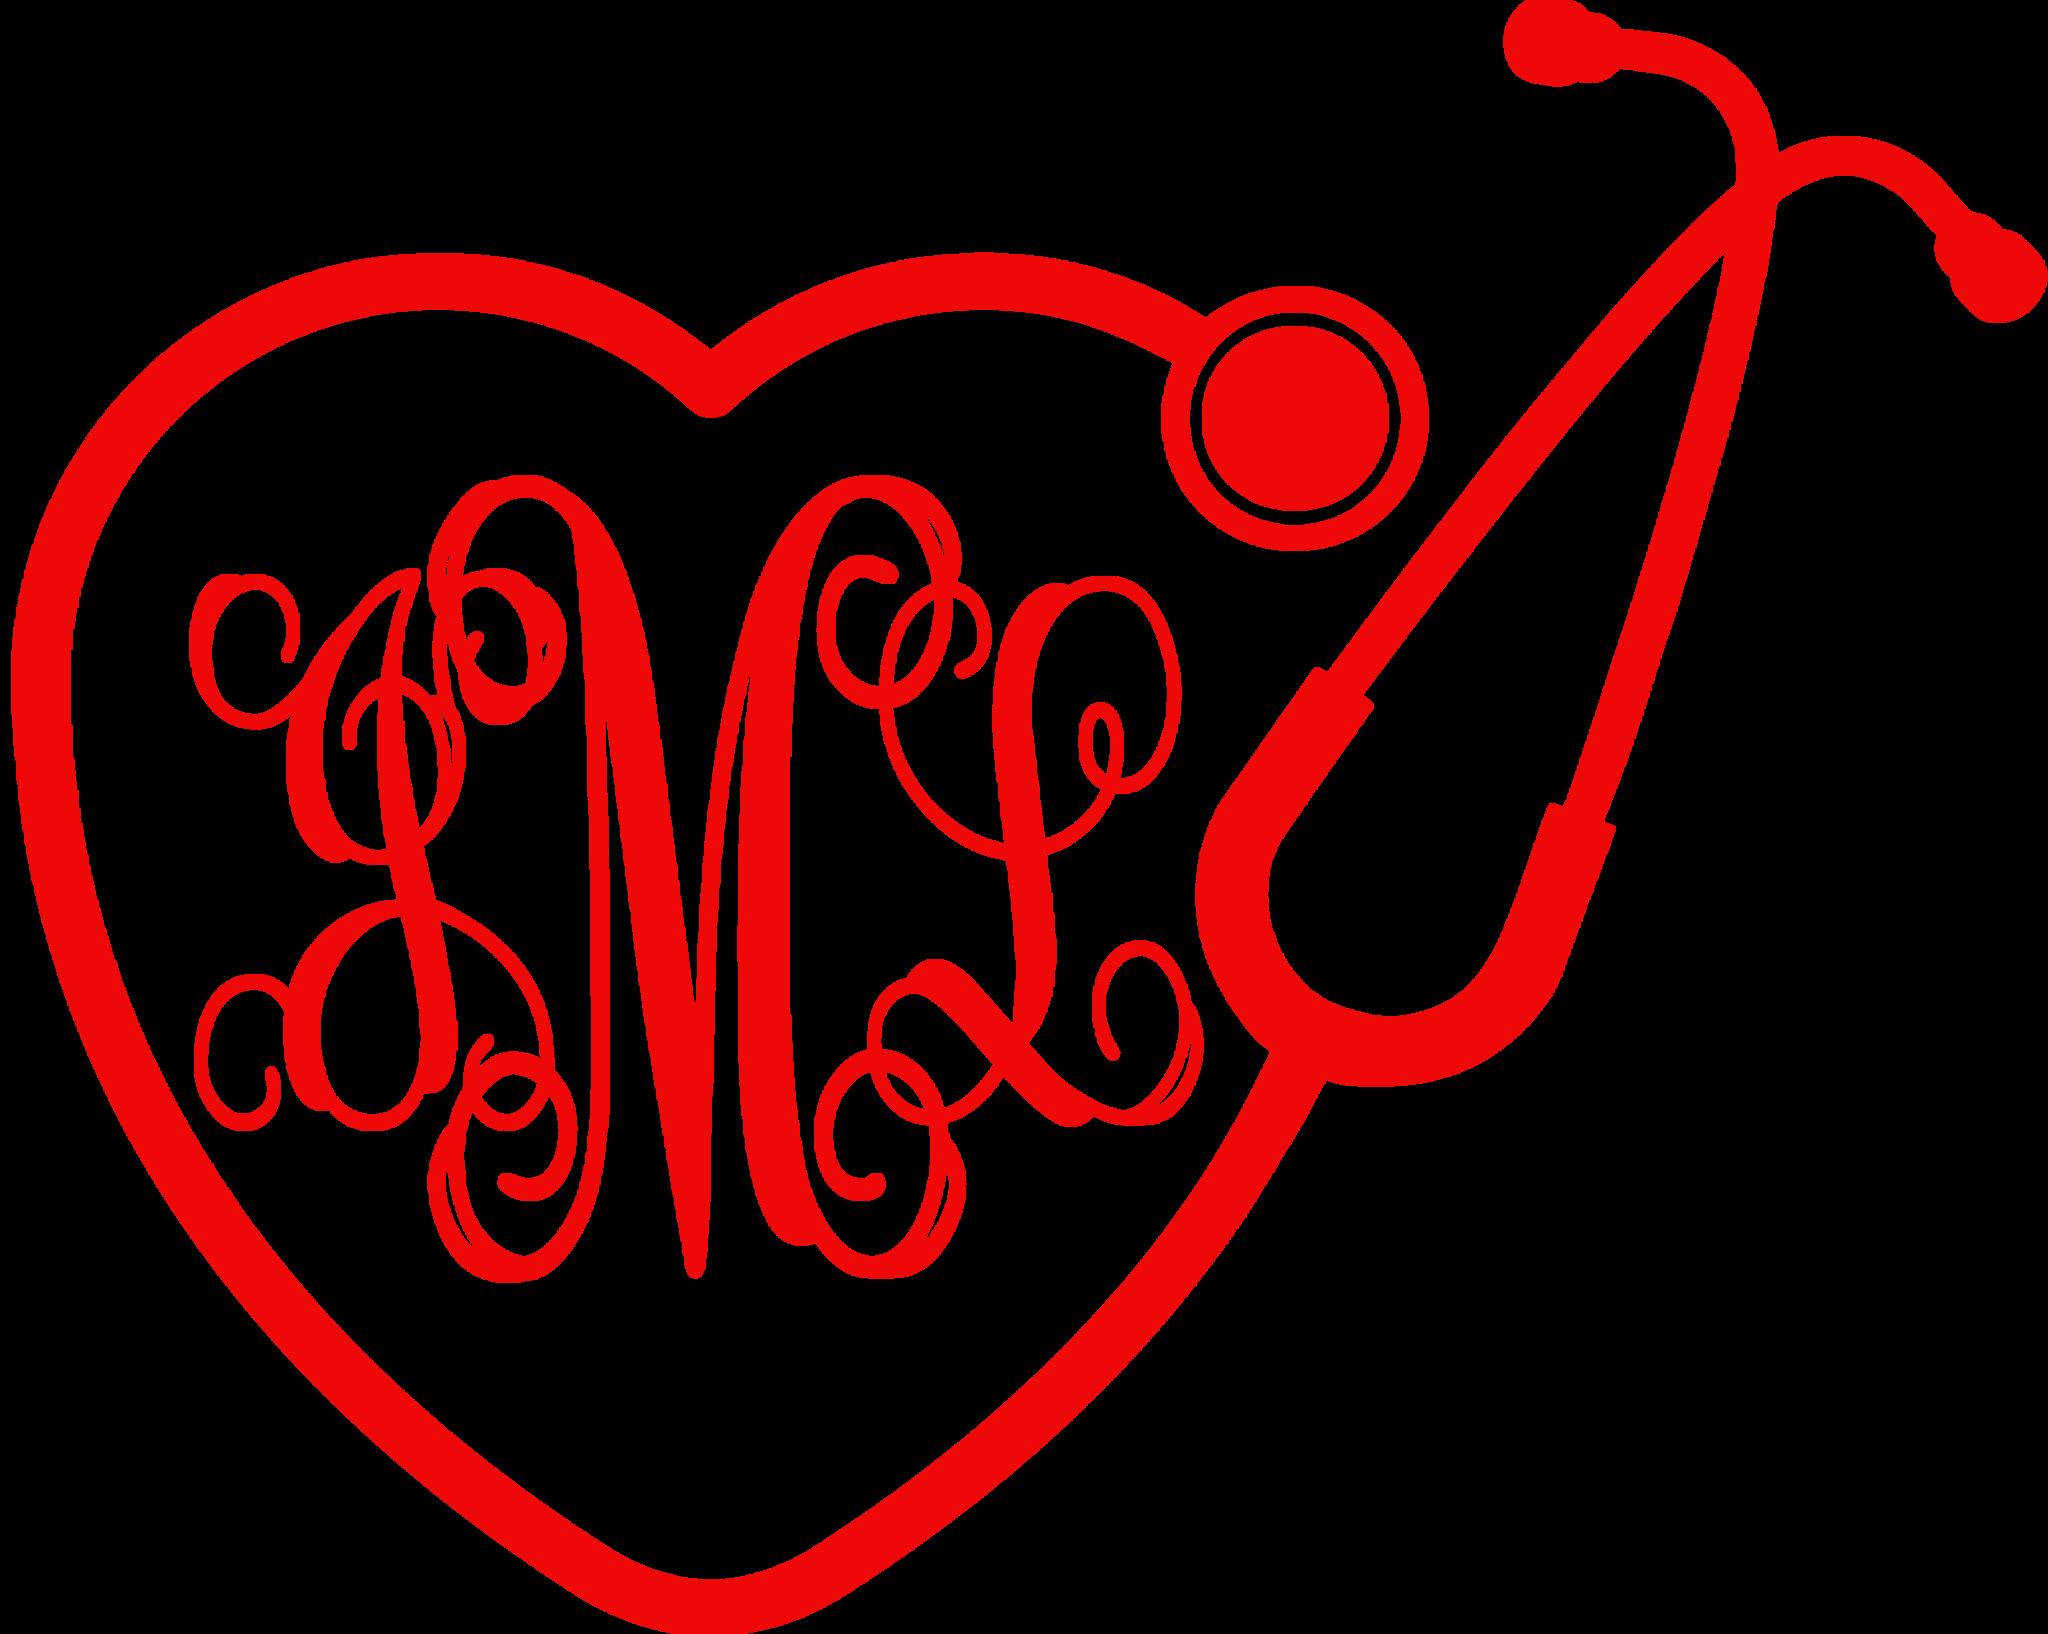 Monogrammed Heart Stethoscope Car Decal Monogram Hearts Car Decals Decals [ 1634 x 2048 Pixel ]